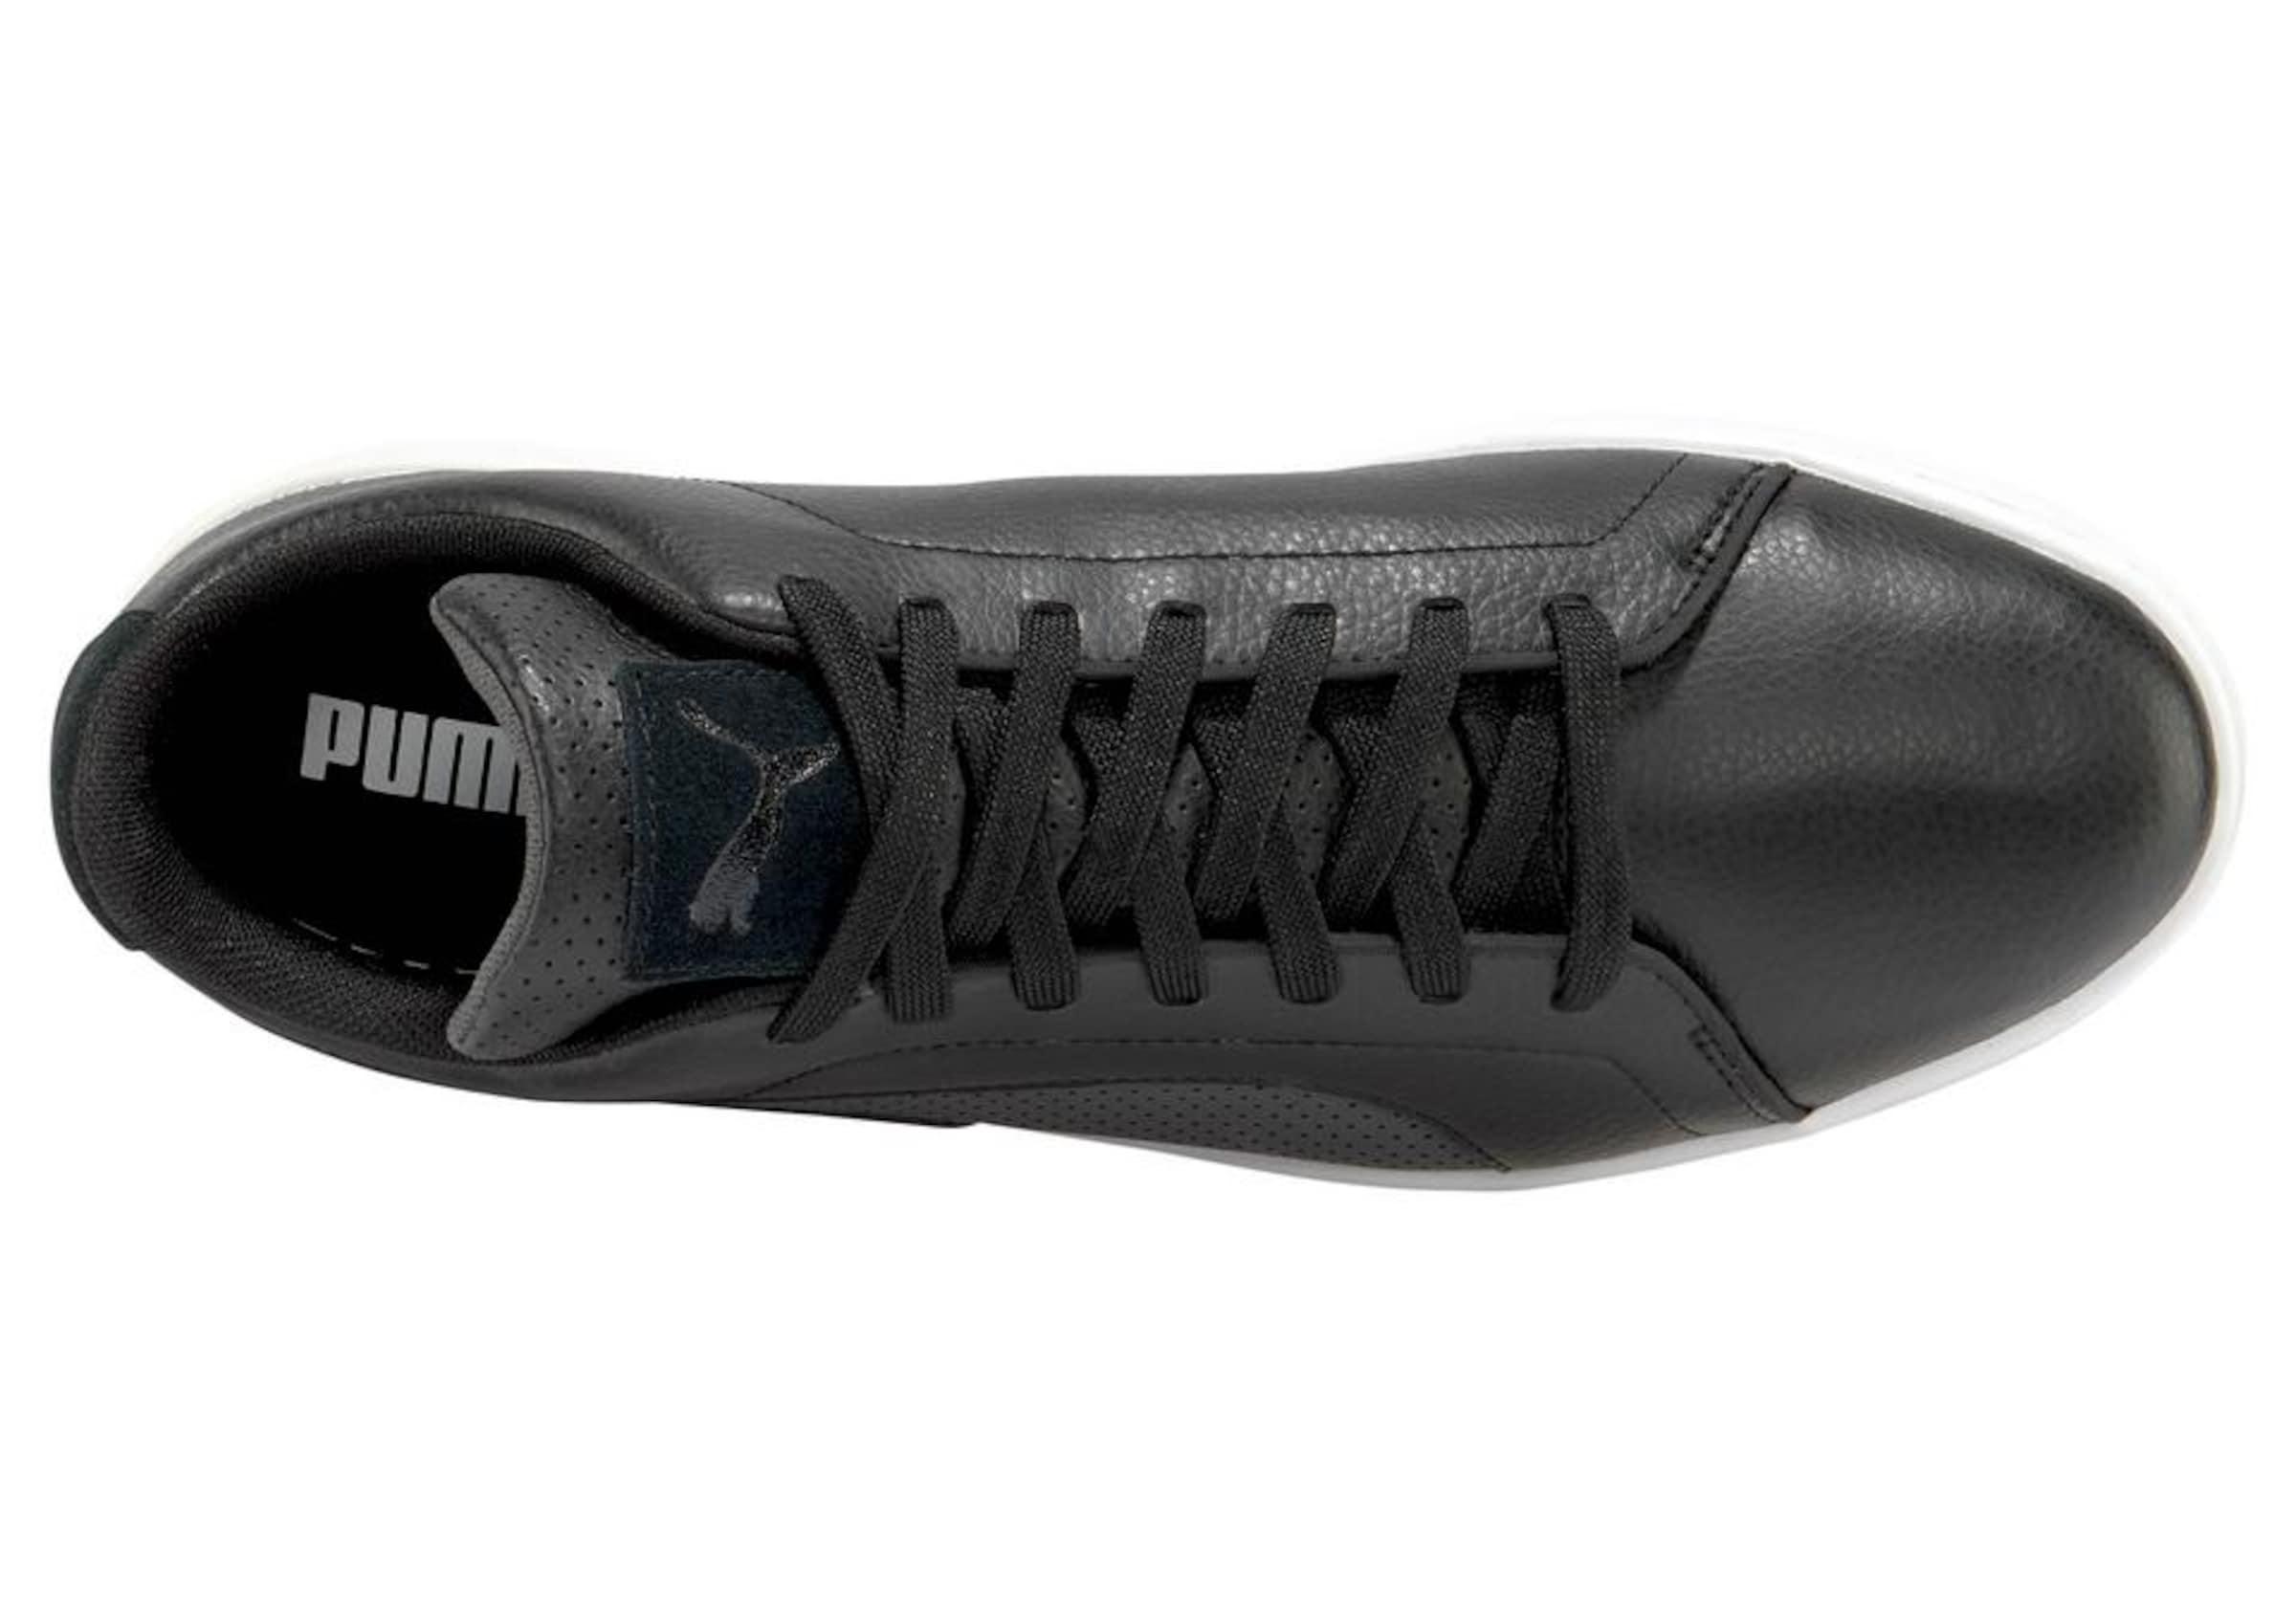 'bmw In Schwarz V2' Smash Sneaker Mms Puma dCoexB